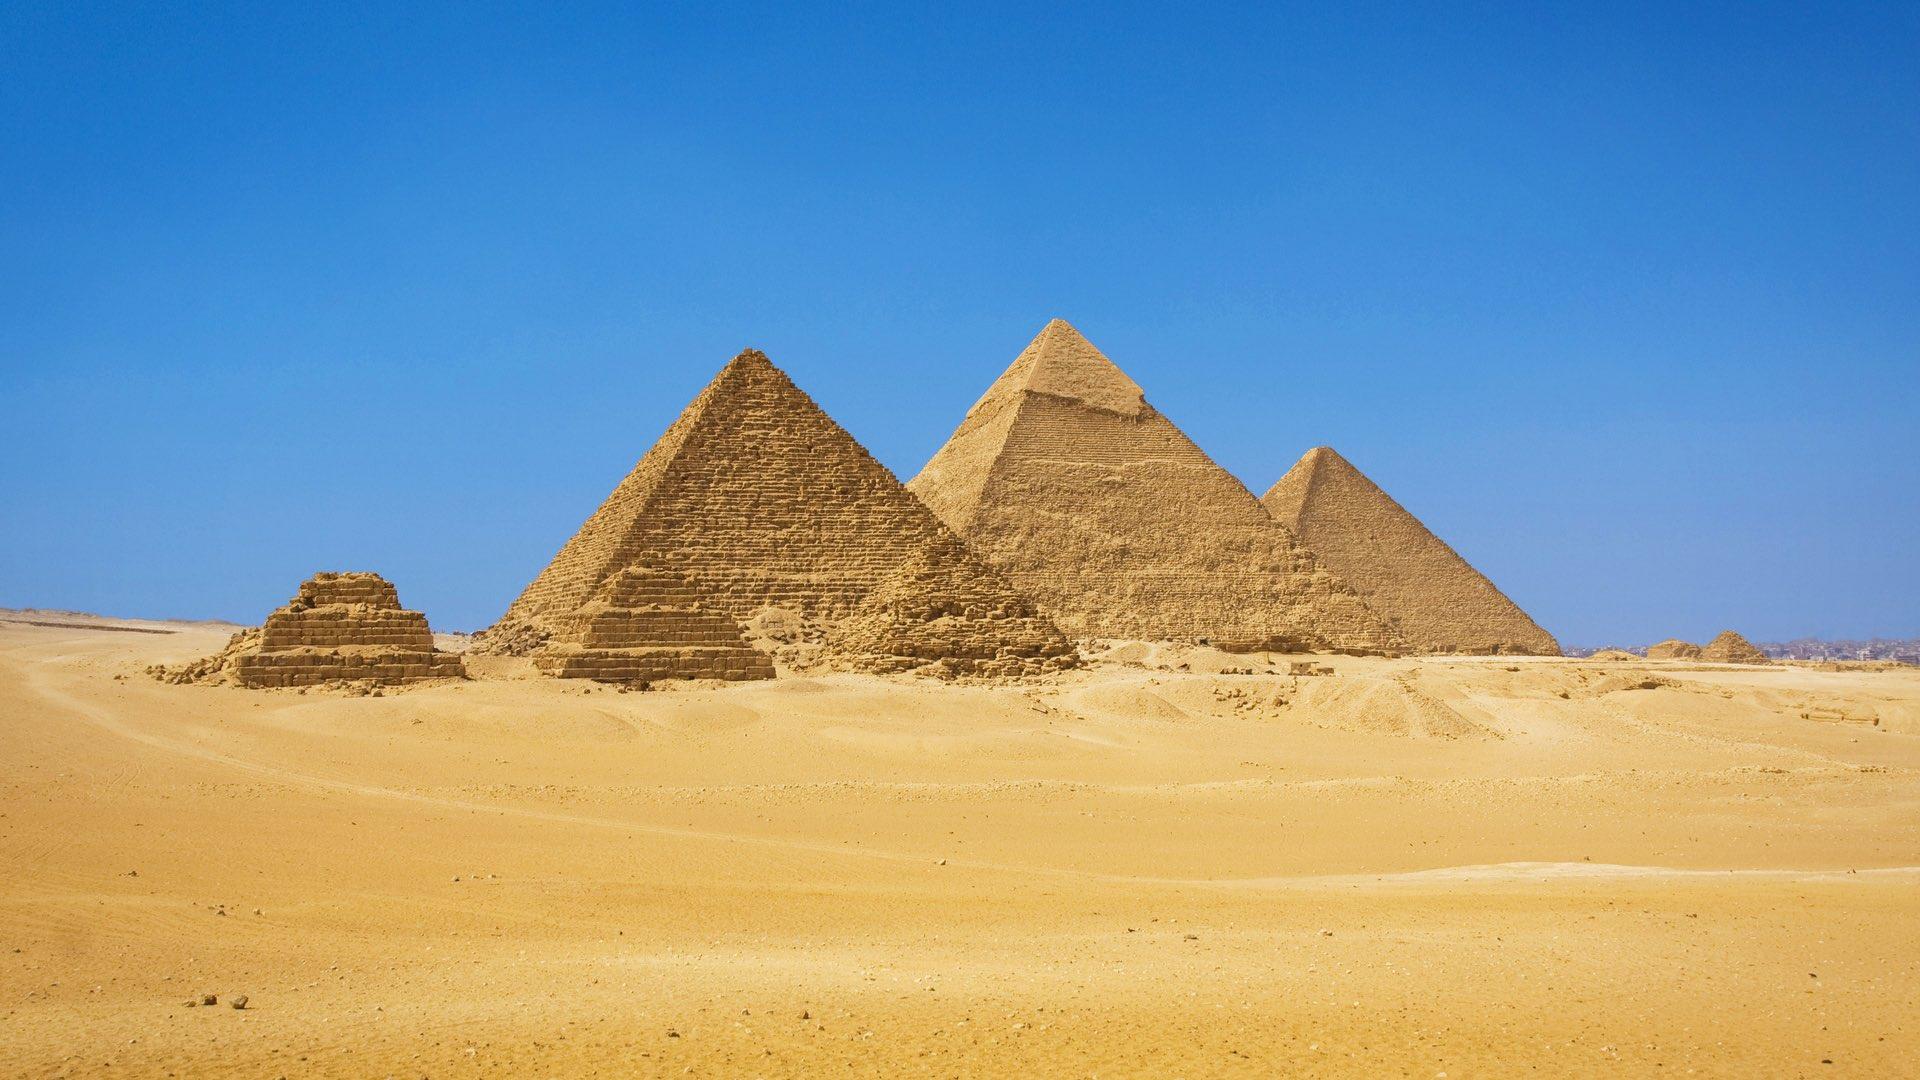 Ägypten | Gizeh | ©Dan Breckwoldt/Shutterstock.com